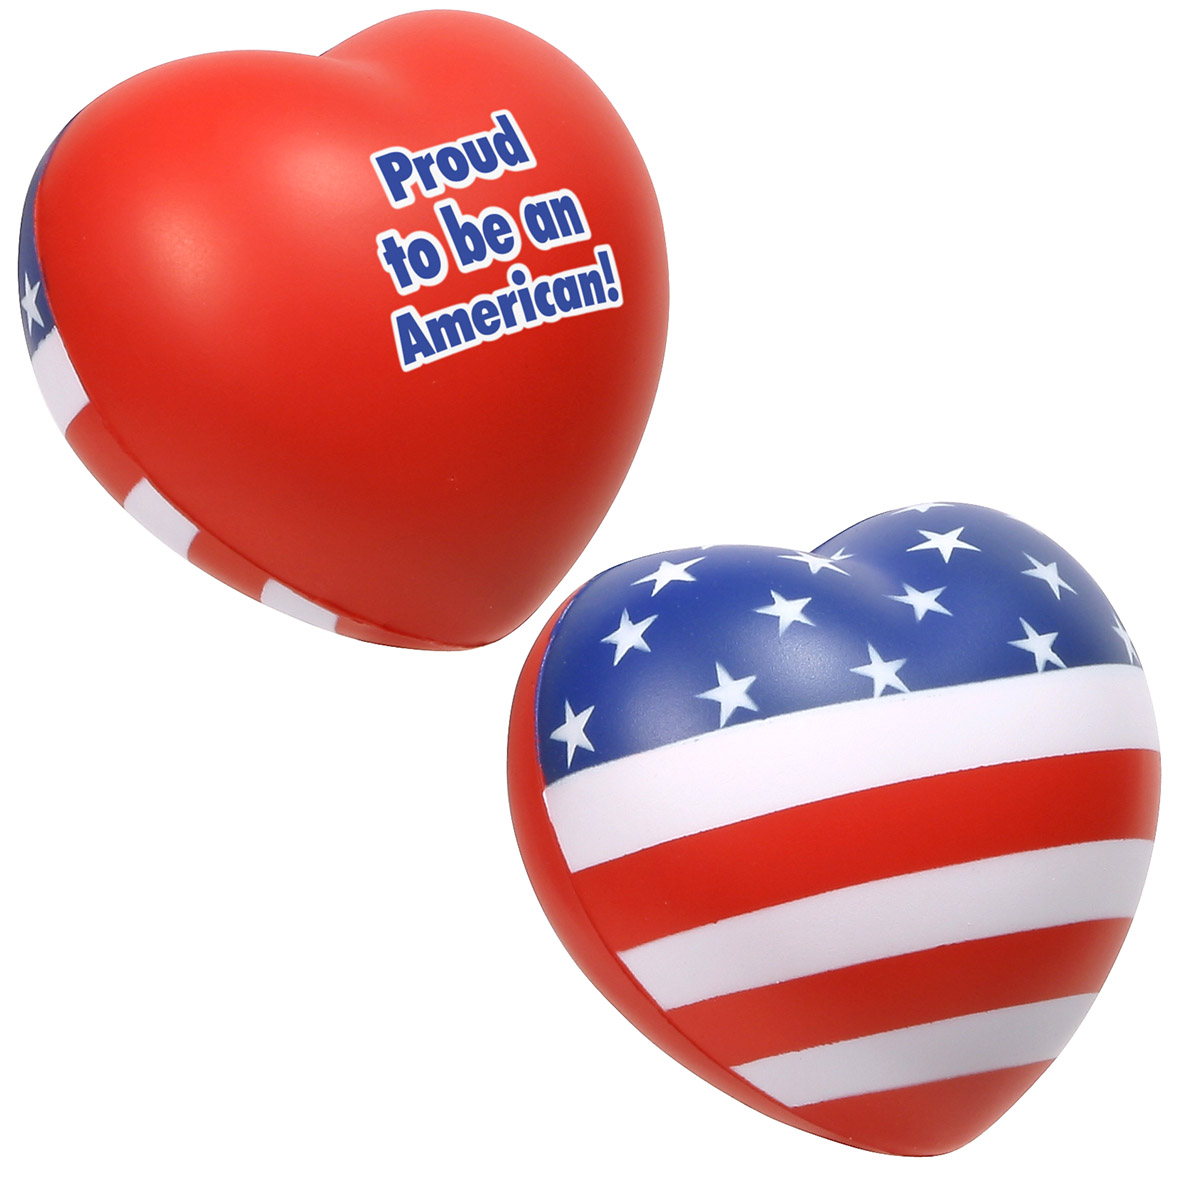 Patriotic Valentine Heart Stress Reliever, LPA-VH07 - 1 Colour Imprint